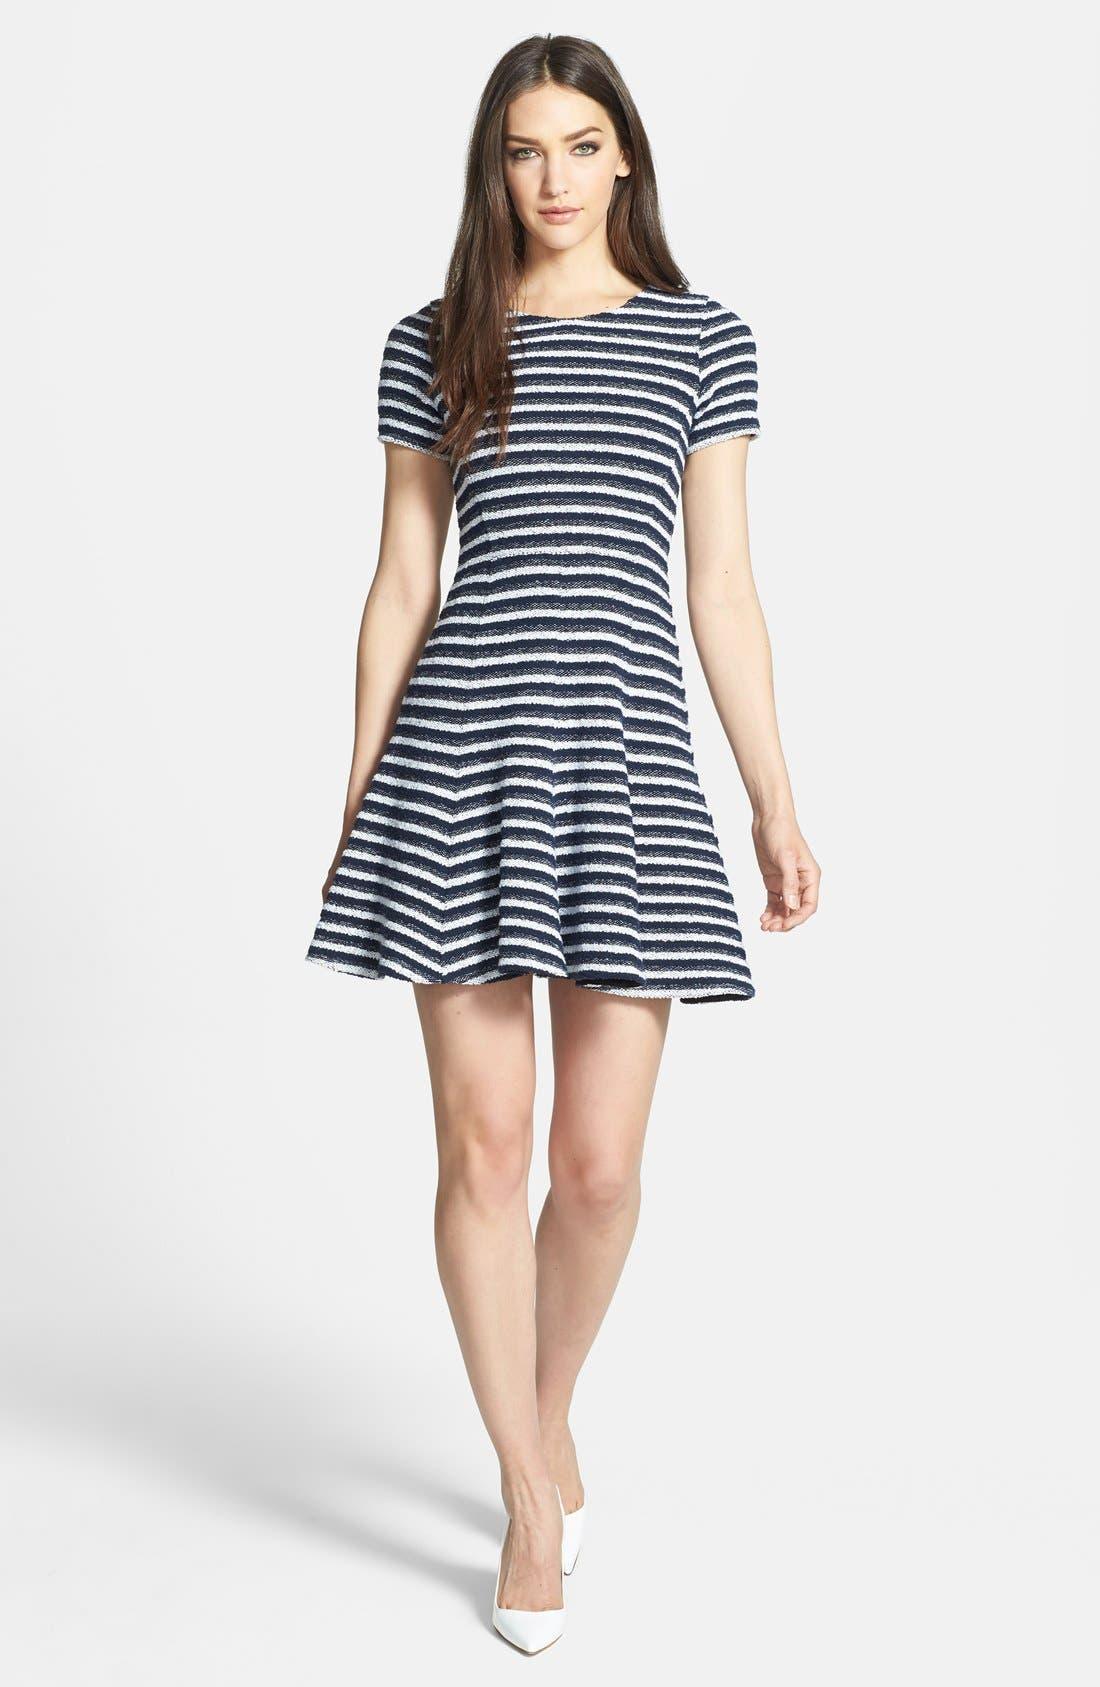 Alternate Image 1 Selected - Theory 'Albita' Bouclé A-Line Dress